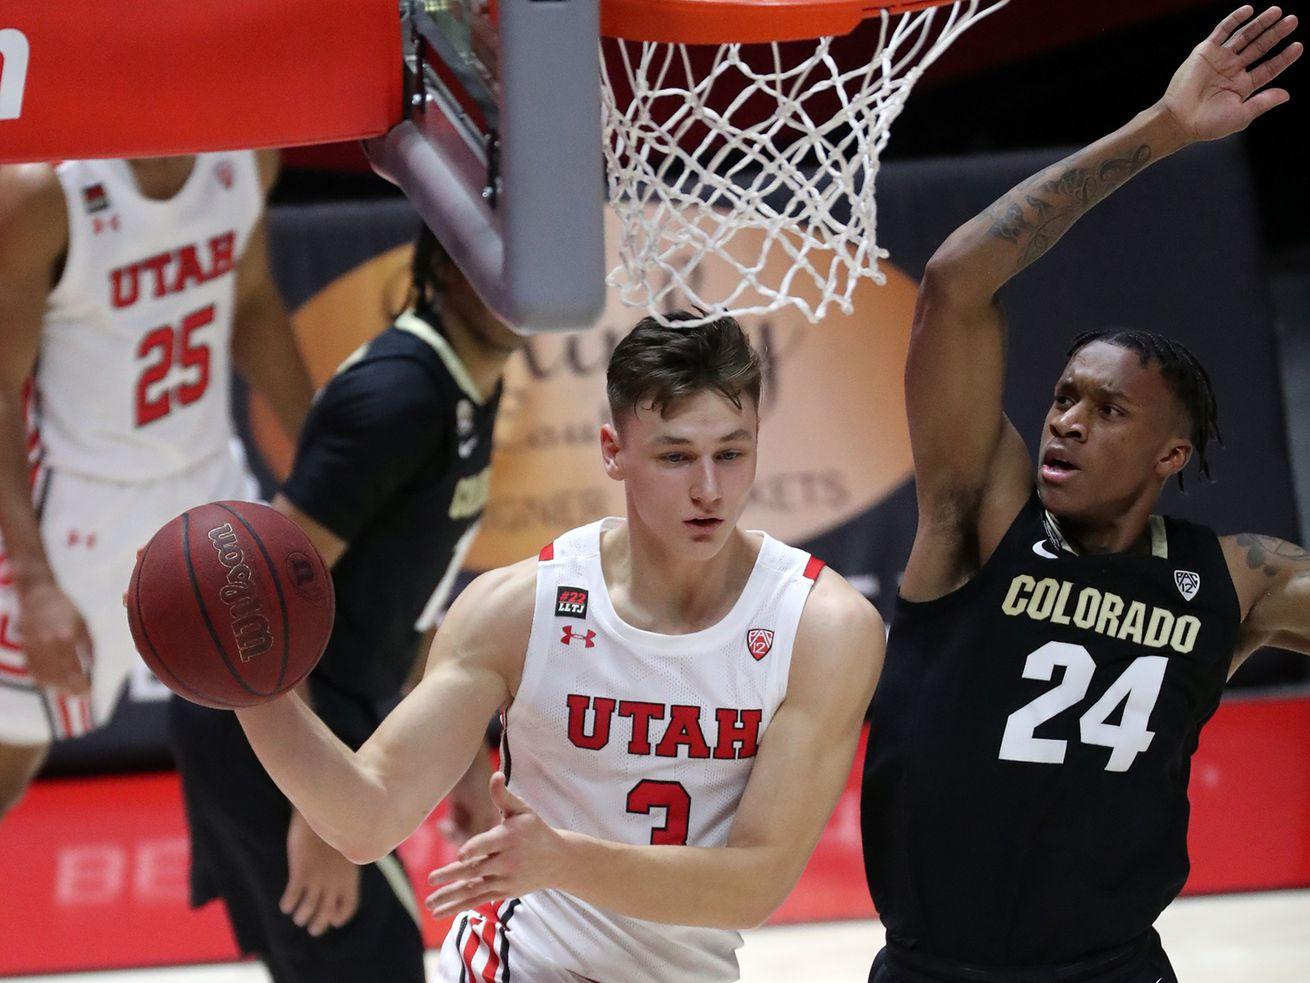 Utah basketball: Freshman guard Pelle Larsson, a Swedish import, making an instant impact for struggling Utes